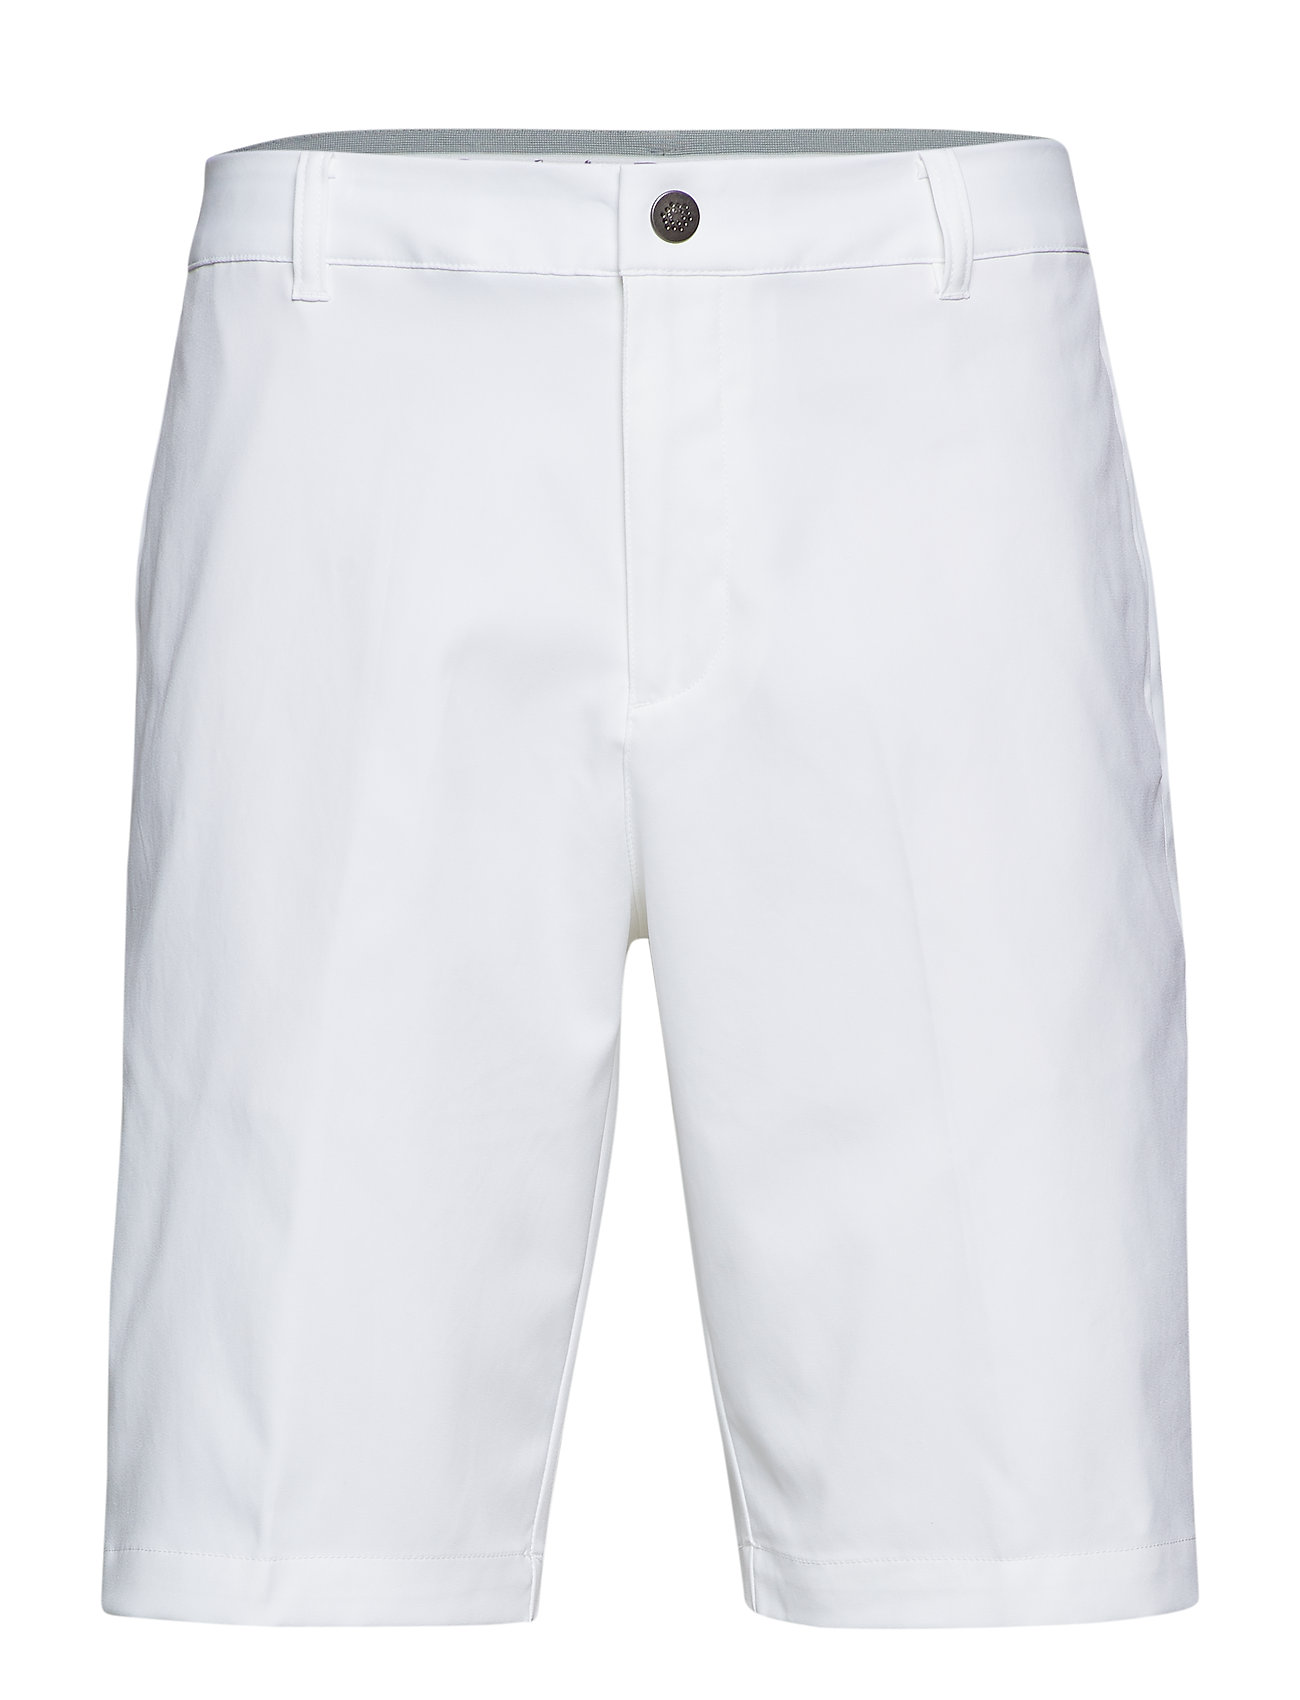 c0de3736d914 Jackpot Short shorts fra PUMA Golf til herre i BRIGHT WHITE - Pashion.dk